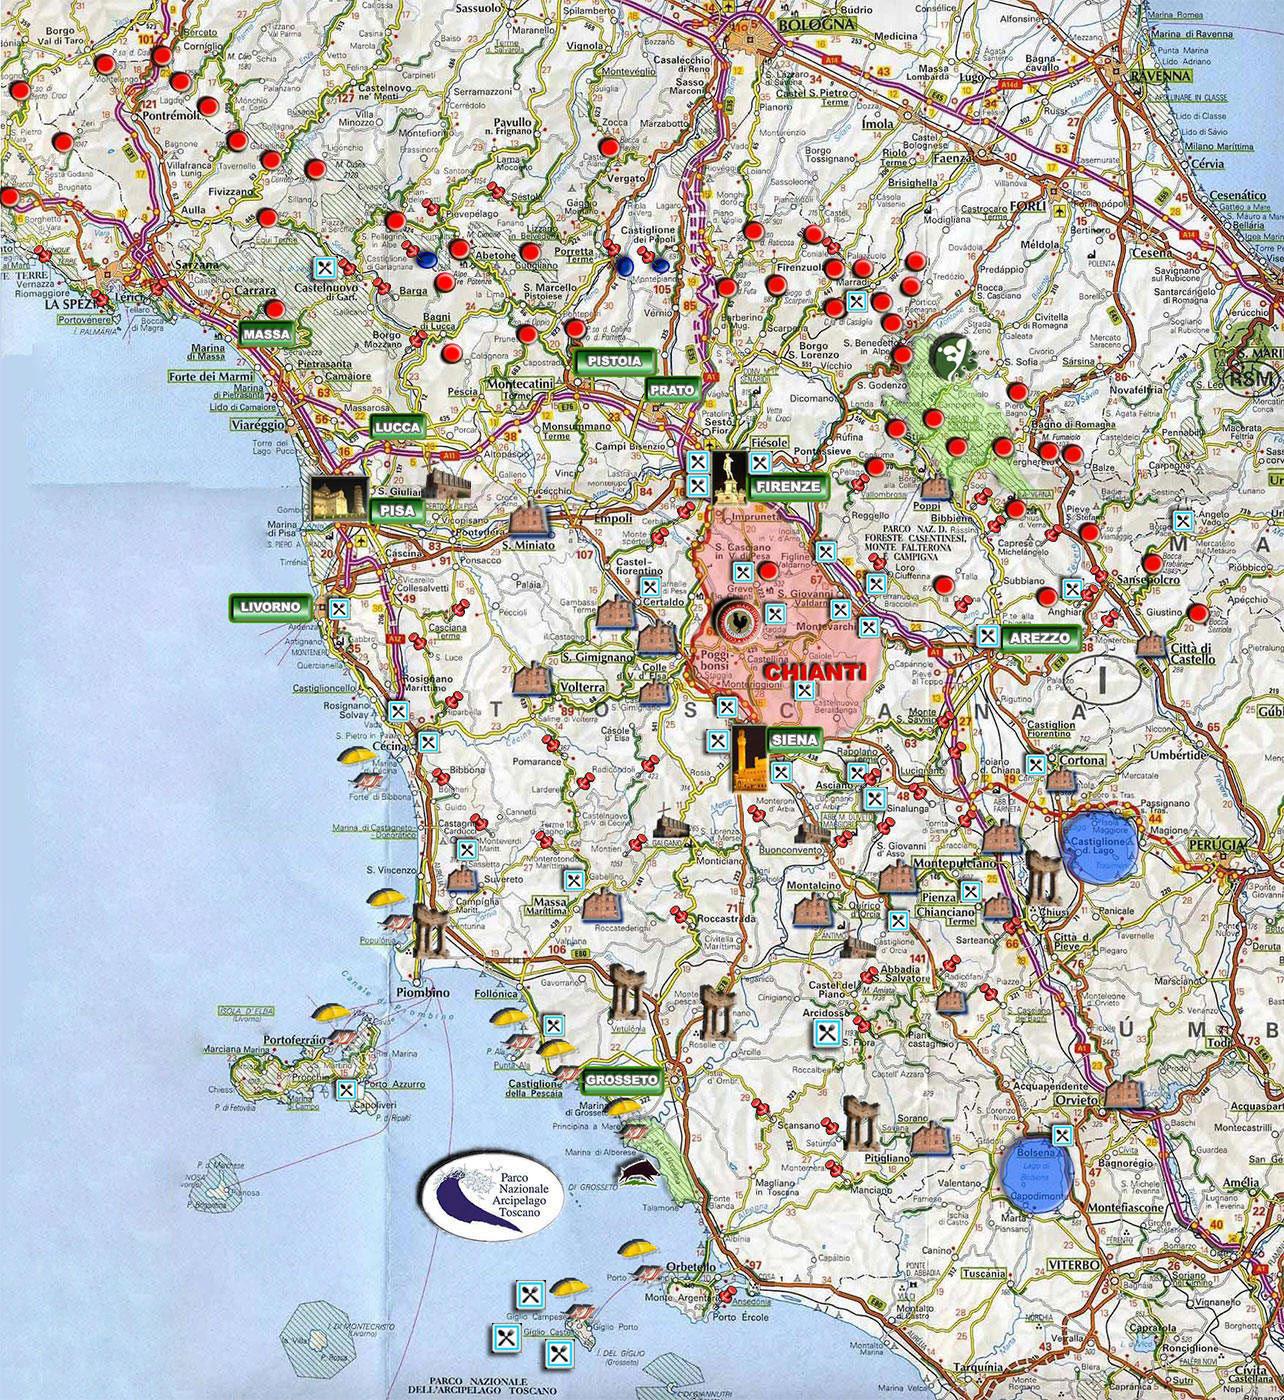 Cartina Toscana Dettagliata.La Cartina Interattiva Toscana Dettagliata